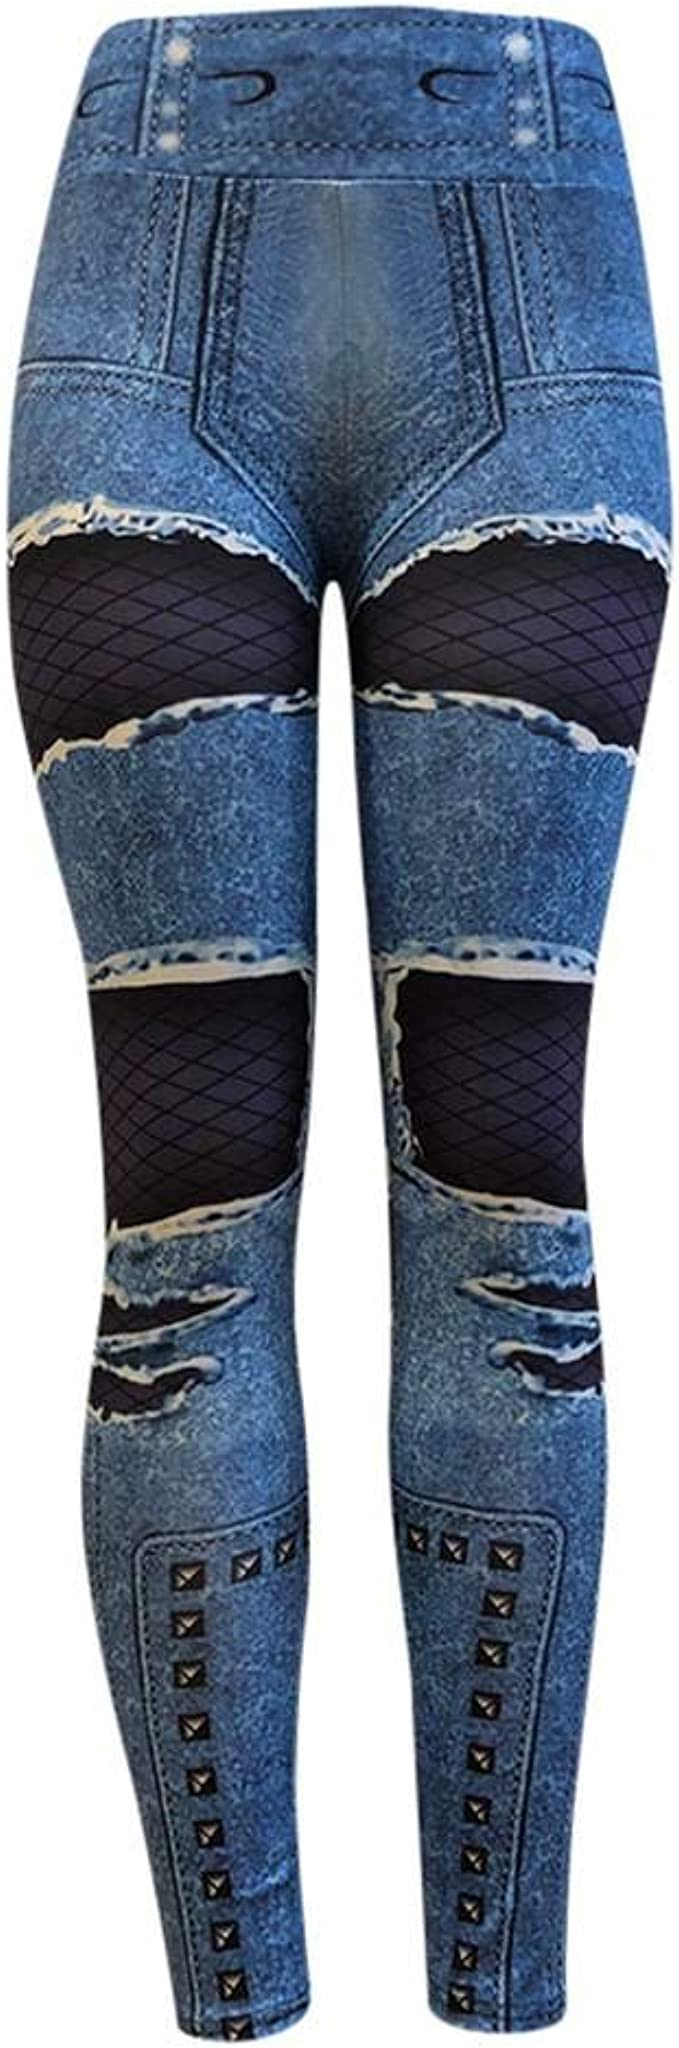 VJGOAL Moda Casual para Mujer Color Profundo Pantalones Vaqueros ...